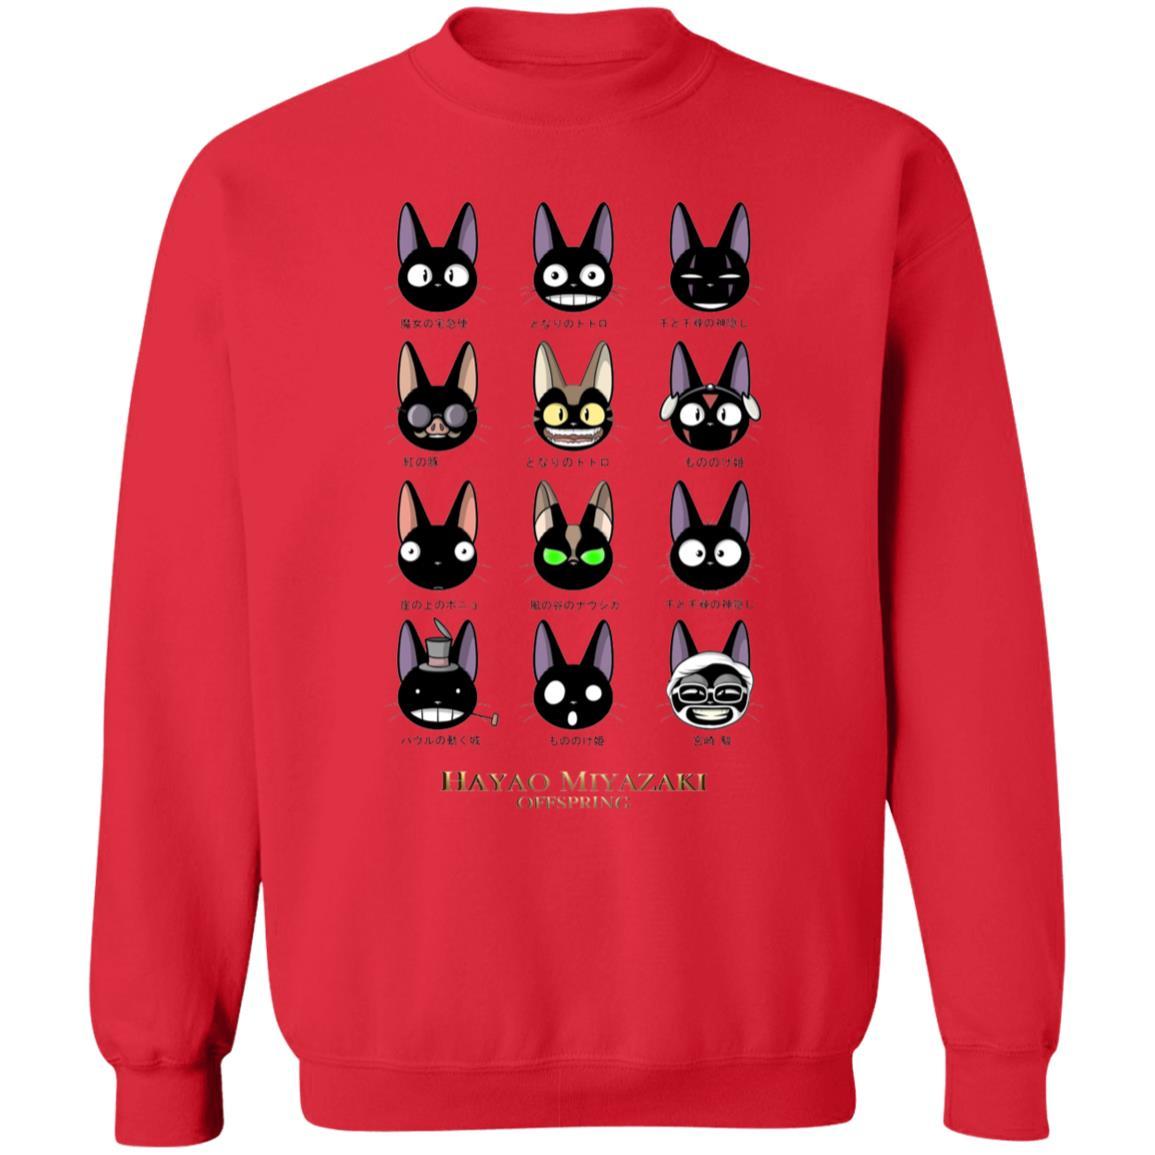 Jiji Hayao Miyazaki Off Spring Sweatshirt